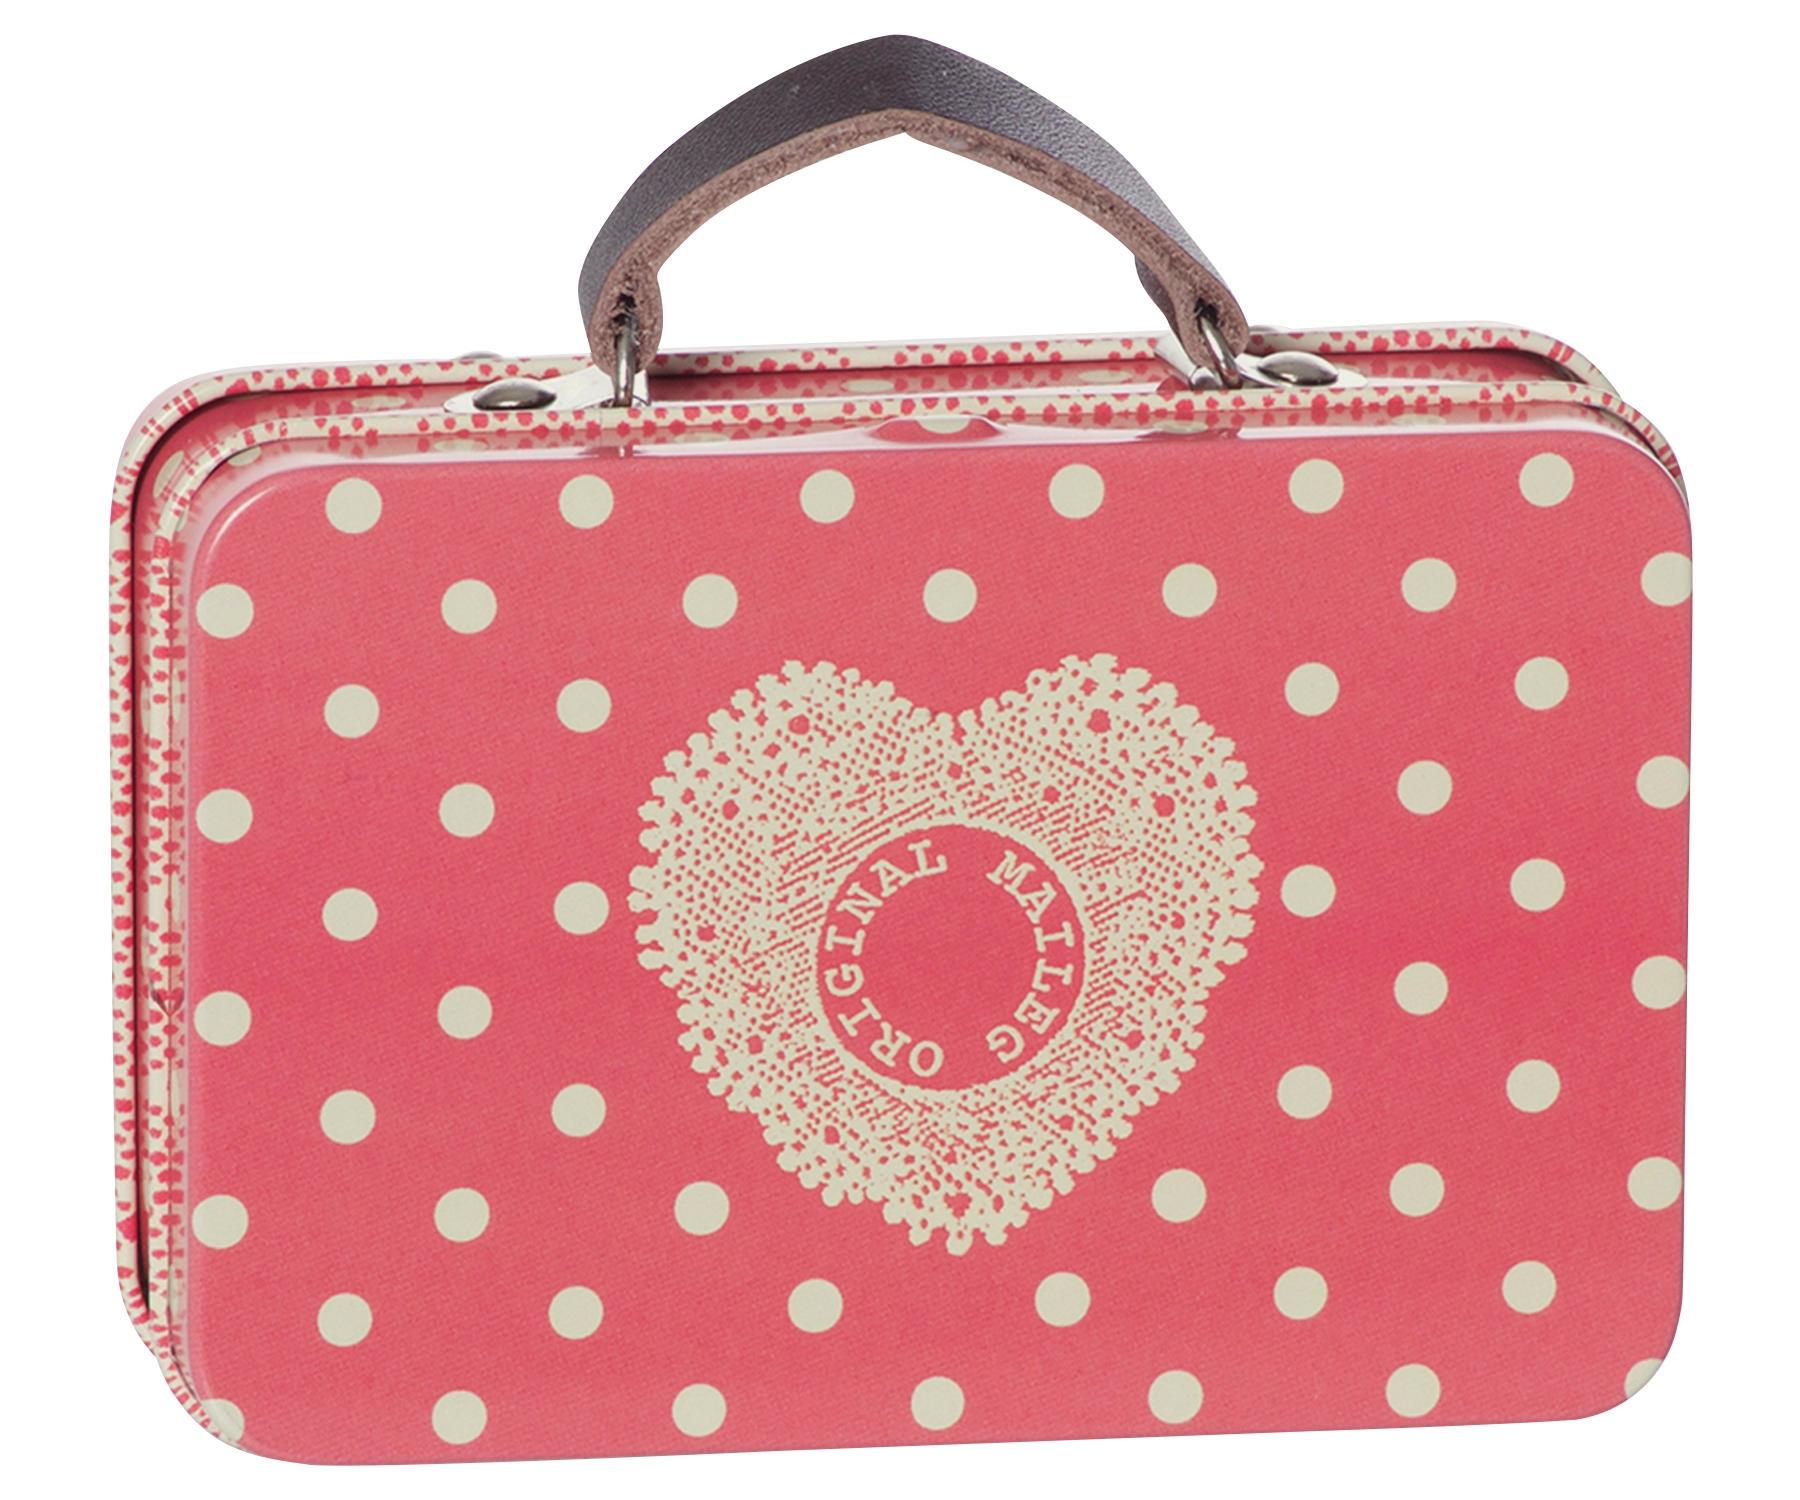 Maileg Plechový mini kufřík Melon, červená barva, kov